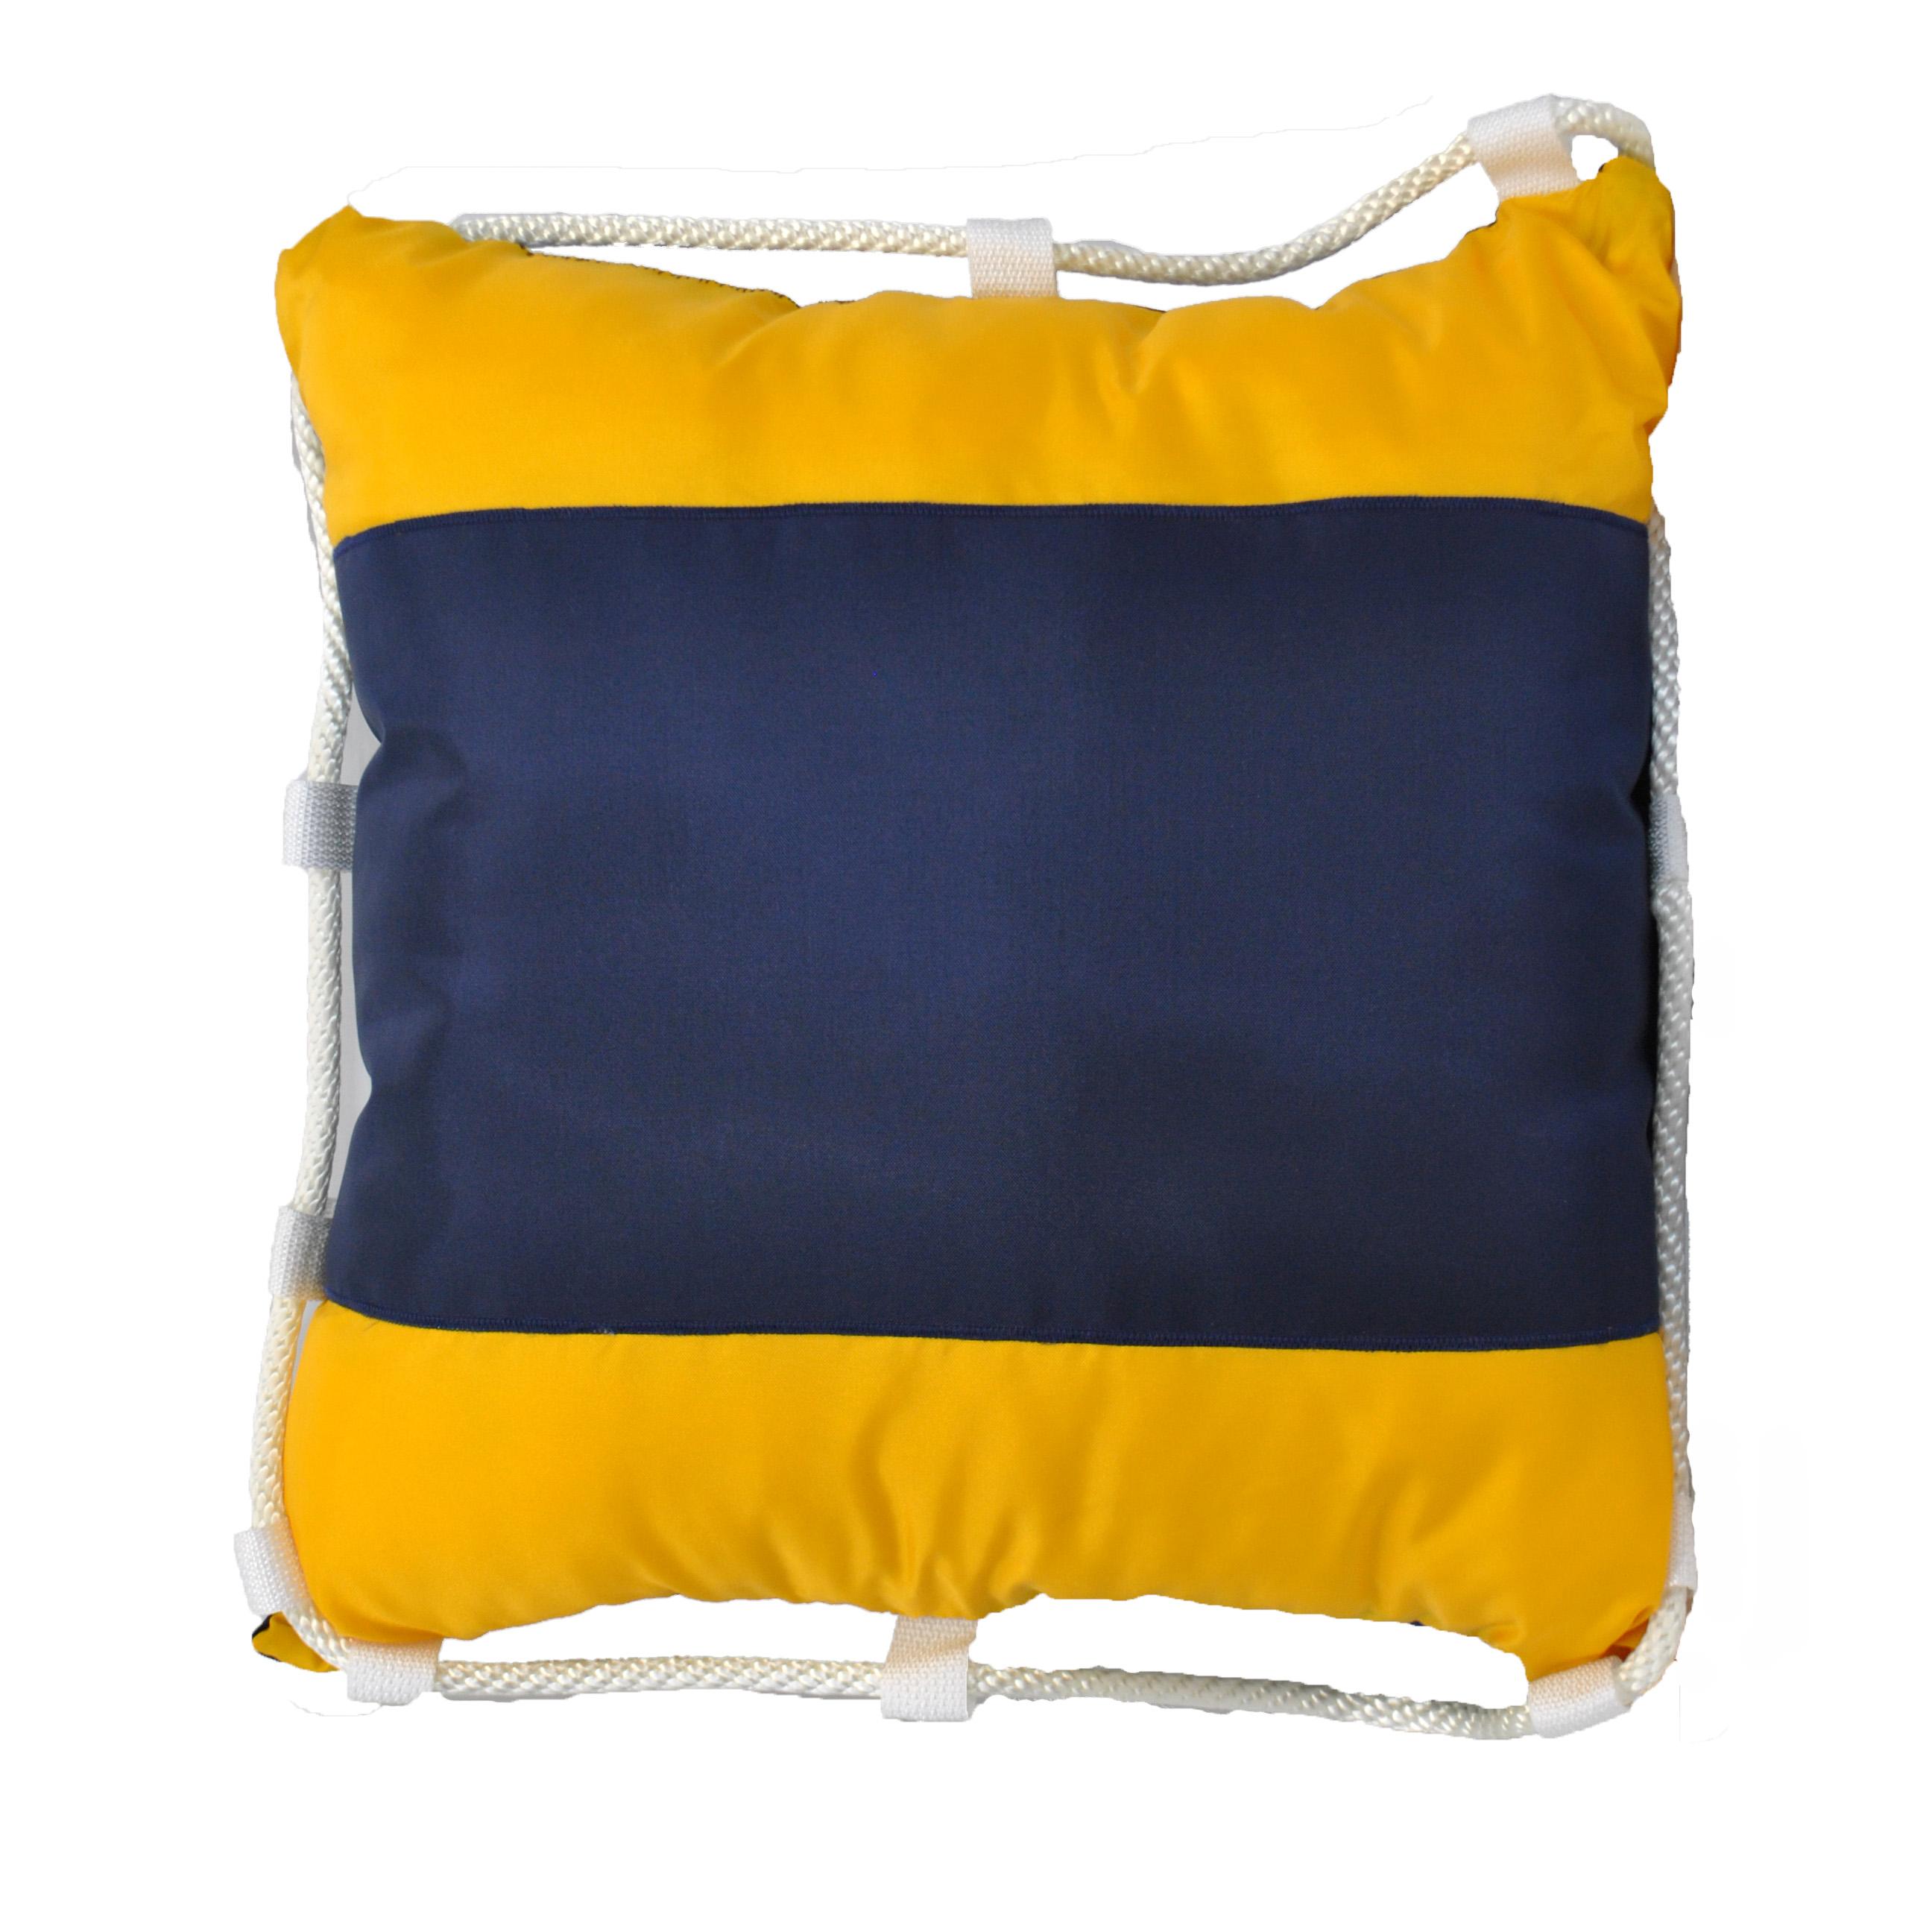 Nautical Throw Pillows For Couch : Nautical Throw Pillows